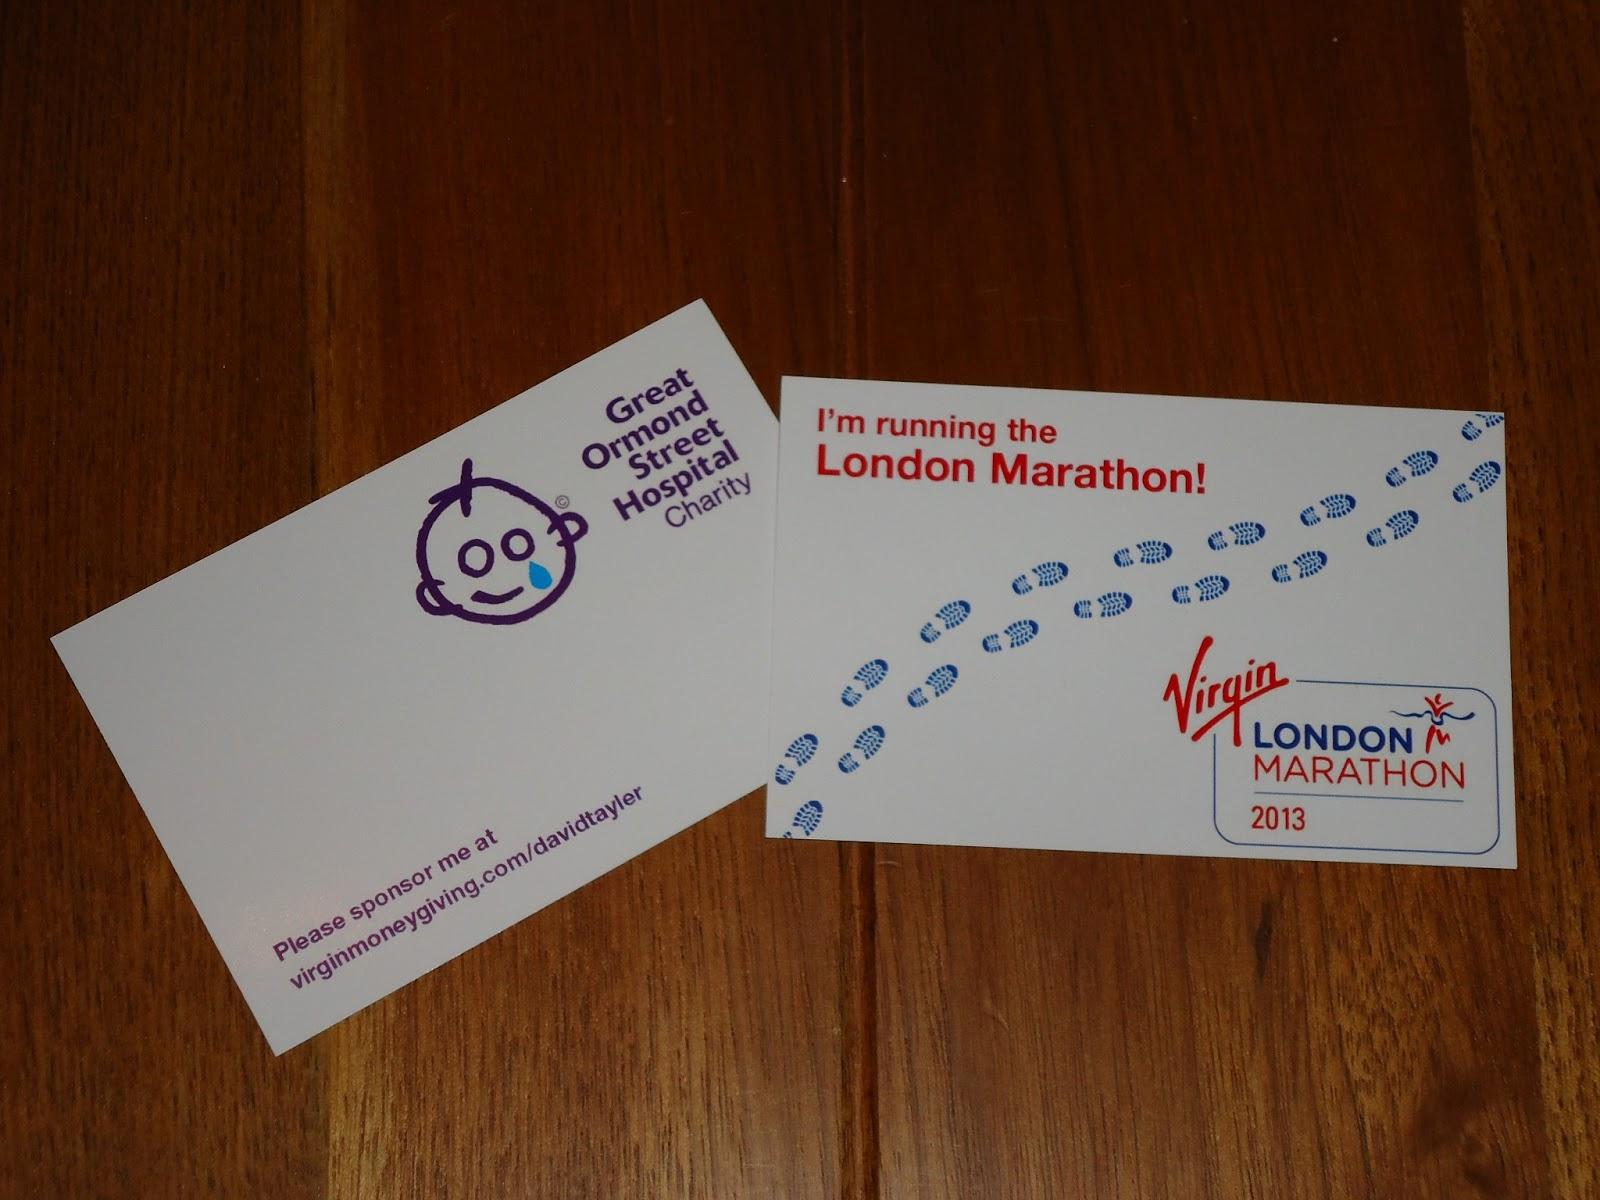 London Marathon Business Cards | afrodisiacDESIGN